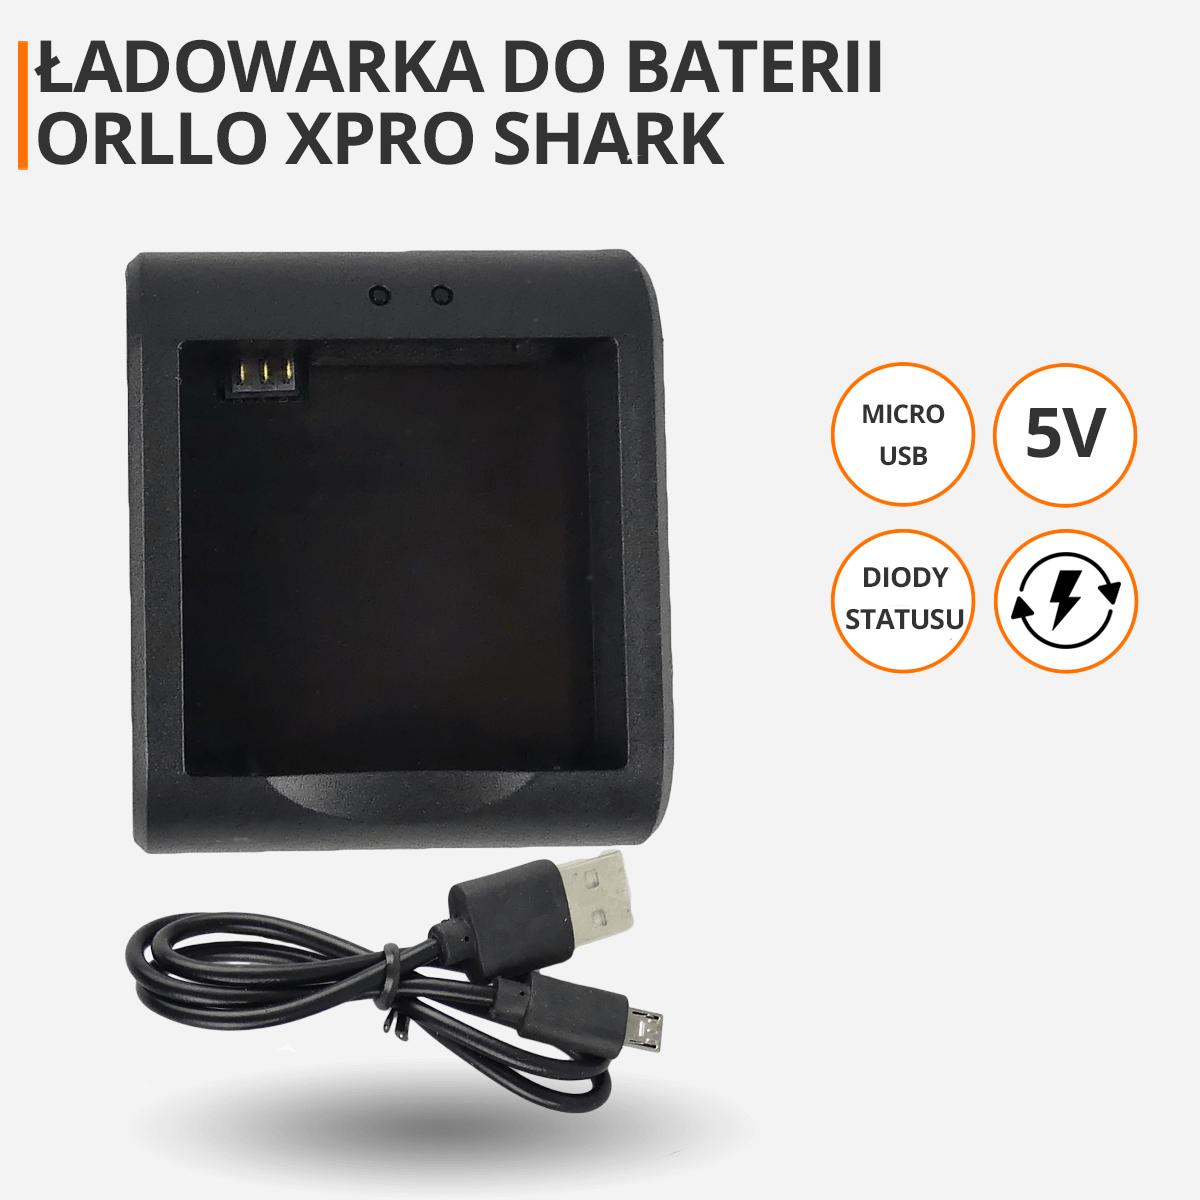 ladowarka-baterii-do-kamery-sportowej-orllo-xpro-shark